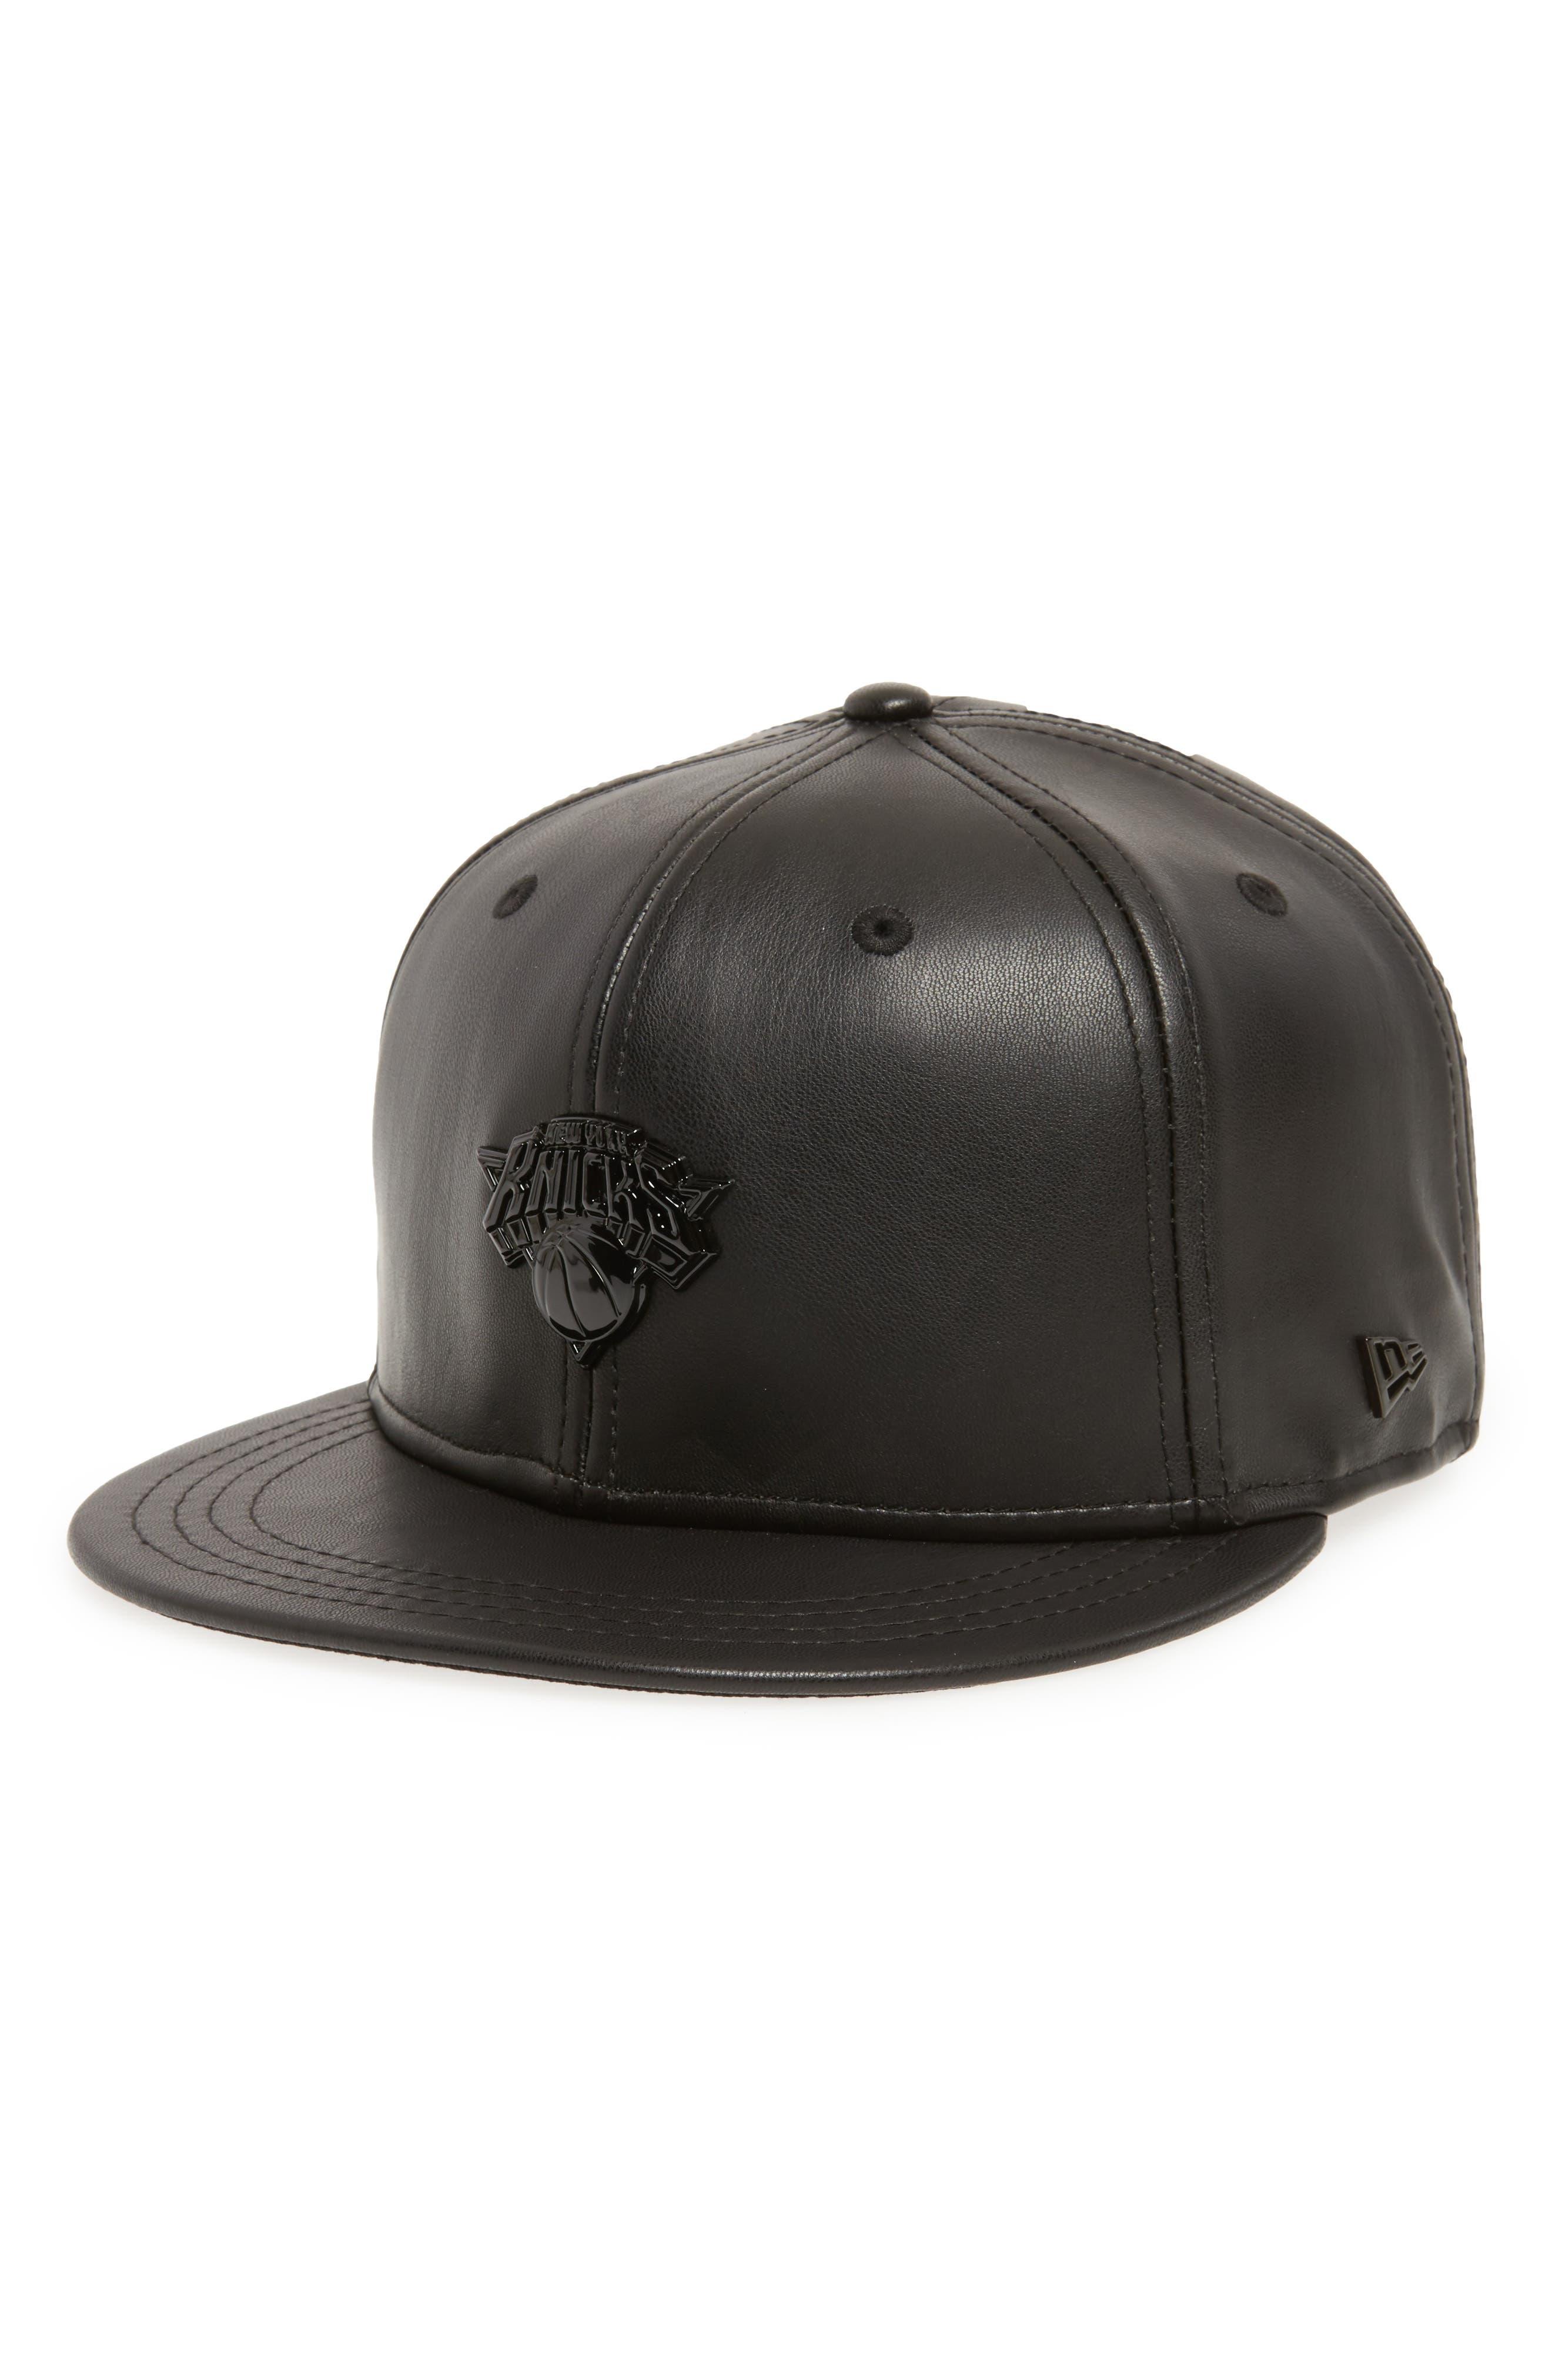 Alternate Image 1 Selected - New Era NBA Glossy Faux Leather Snapback Cap